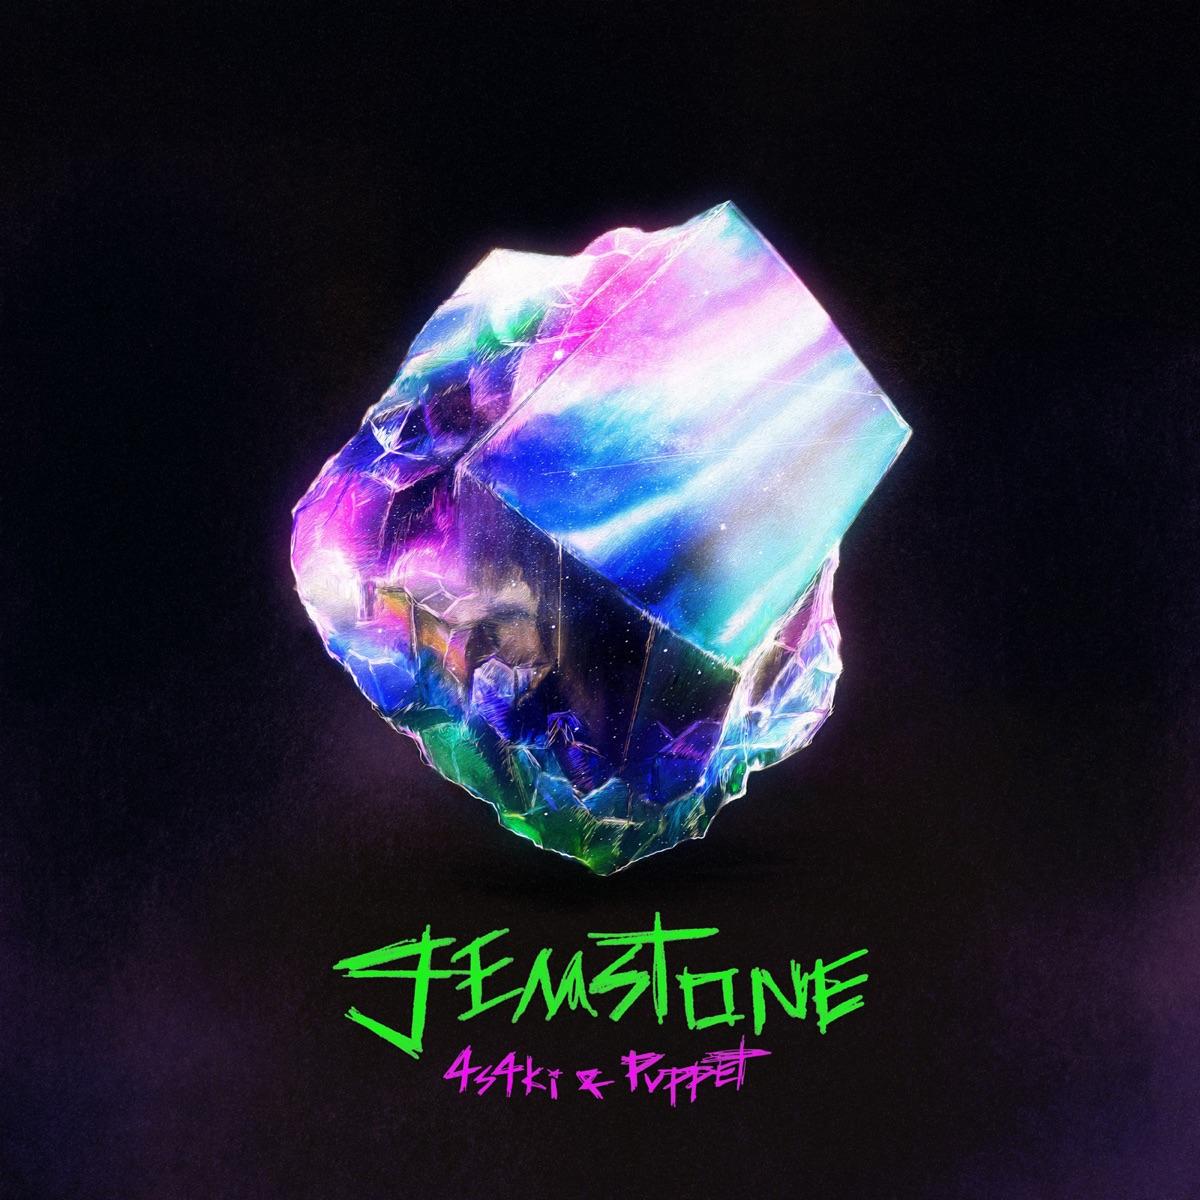 『4s4ki - gemstone feat. Puppet』収録の『gemstone feat. Puppet』ジャケット